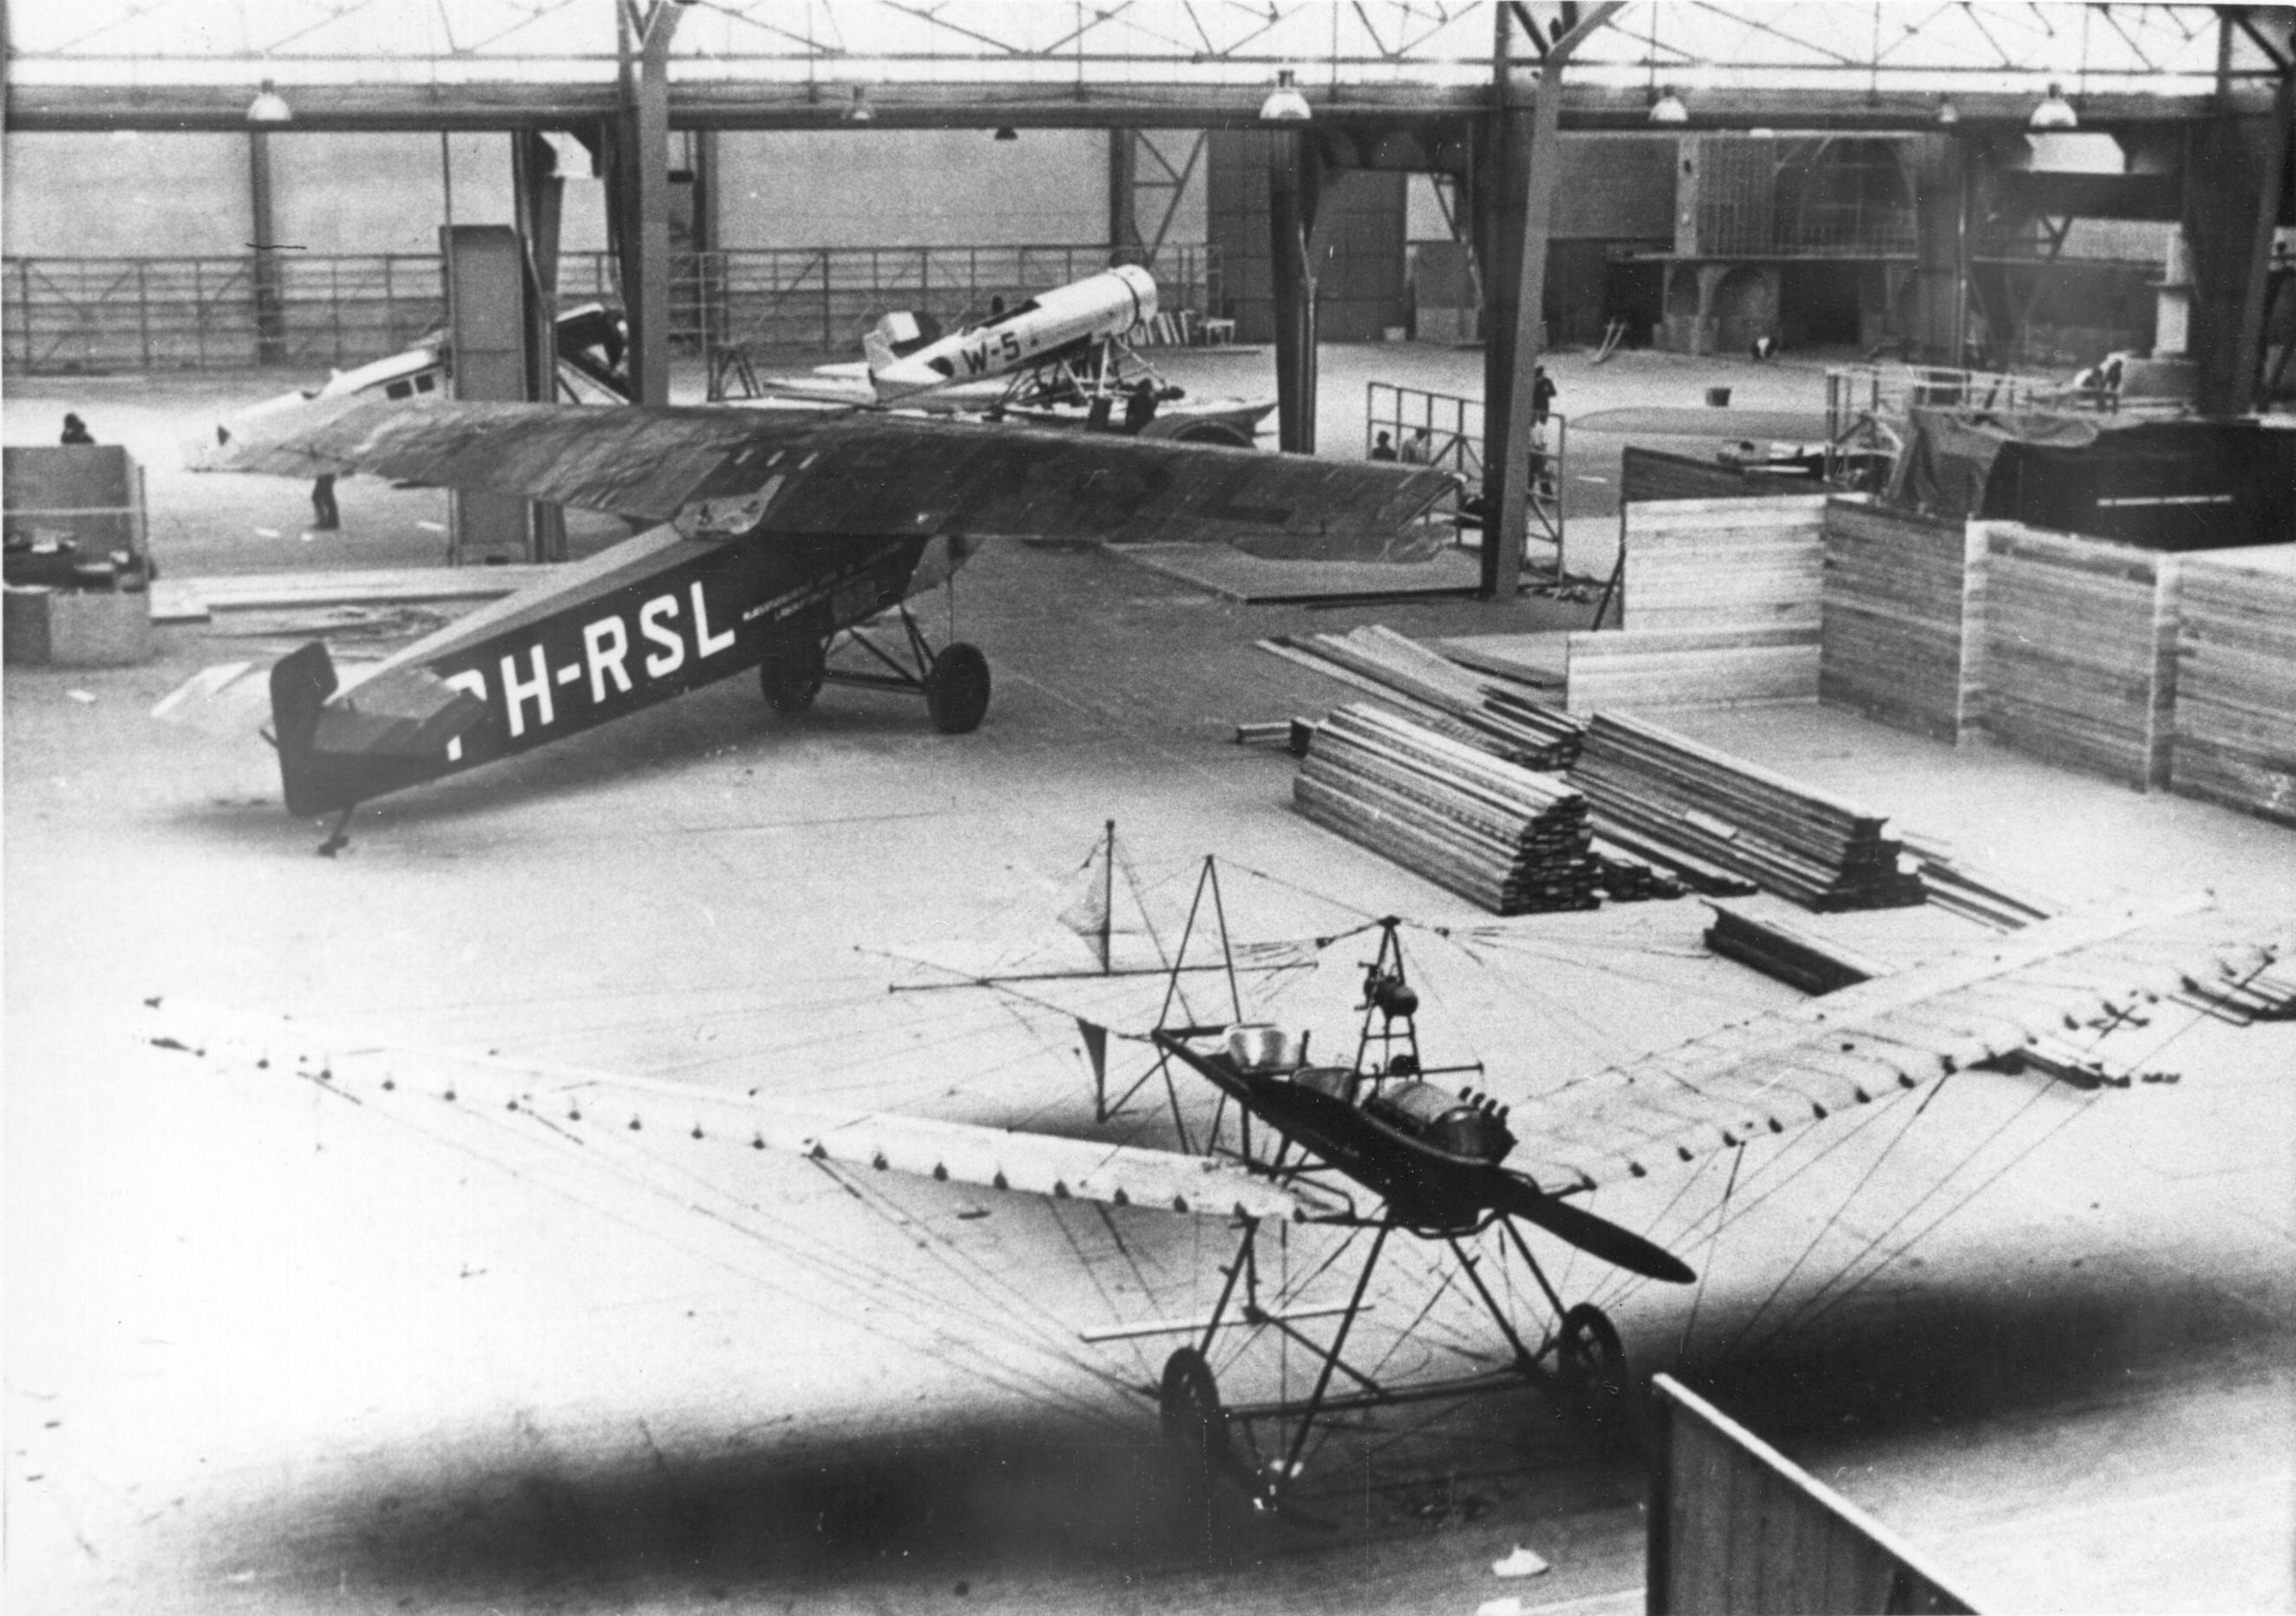 Naam: Schiphol 1939 FK26, C-11, F-7a, Spin via GJTORNIJ.jpg Bekeken: 120 Grootte: 515,8 KB